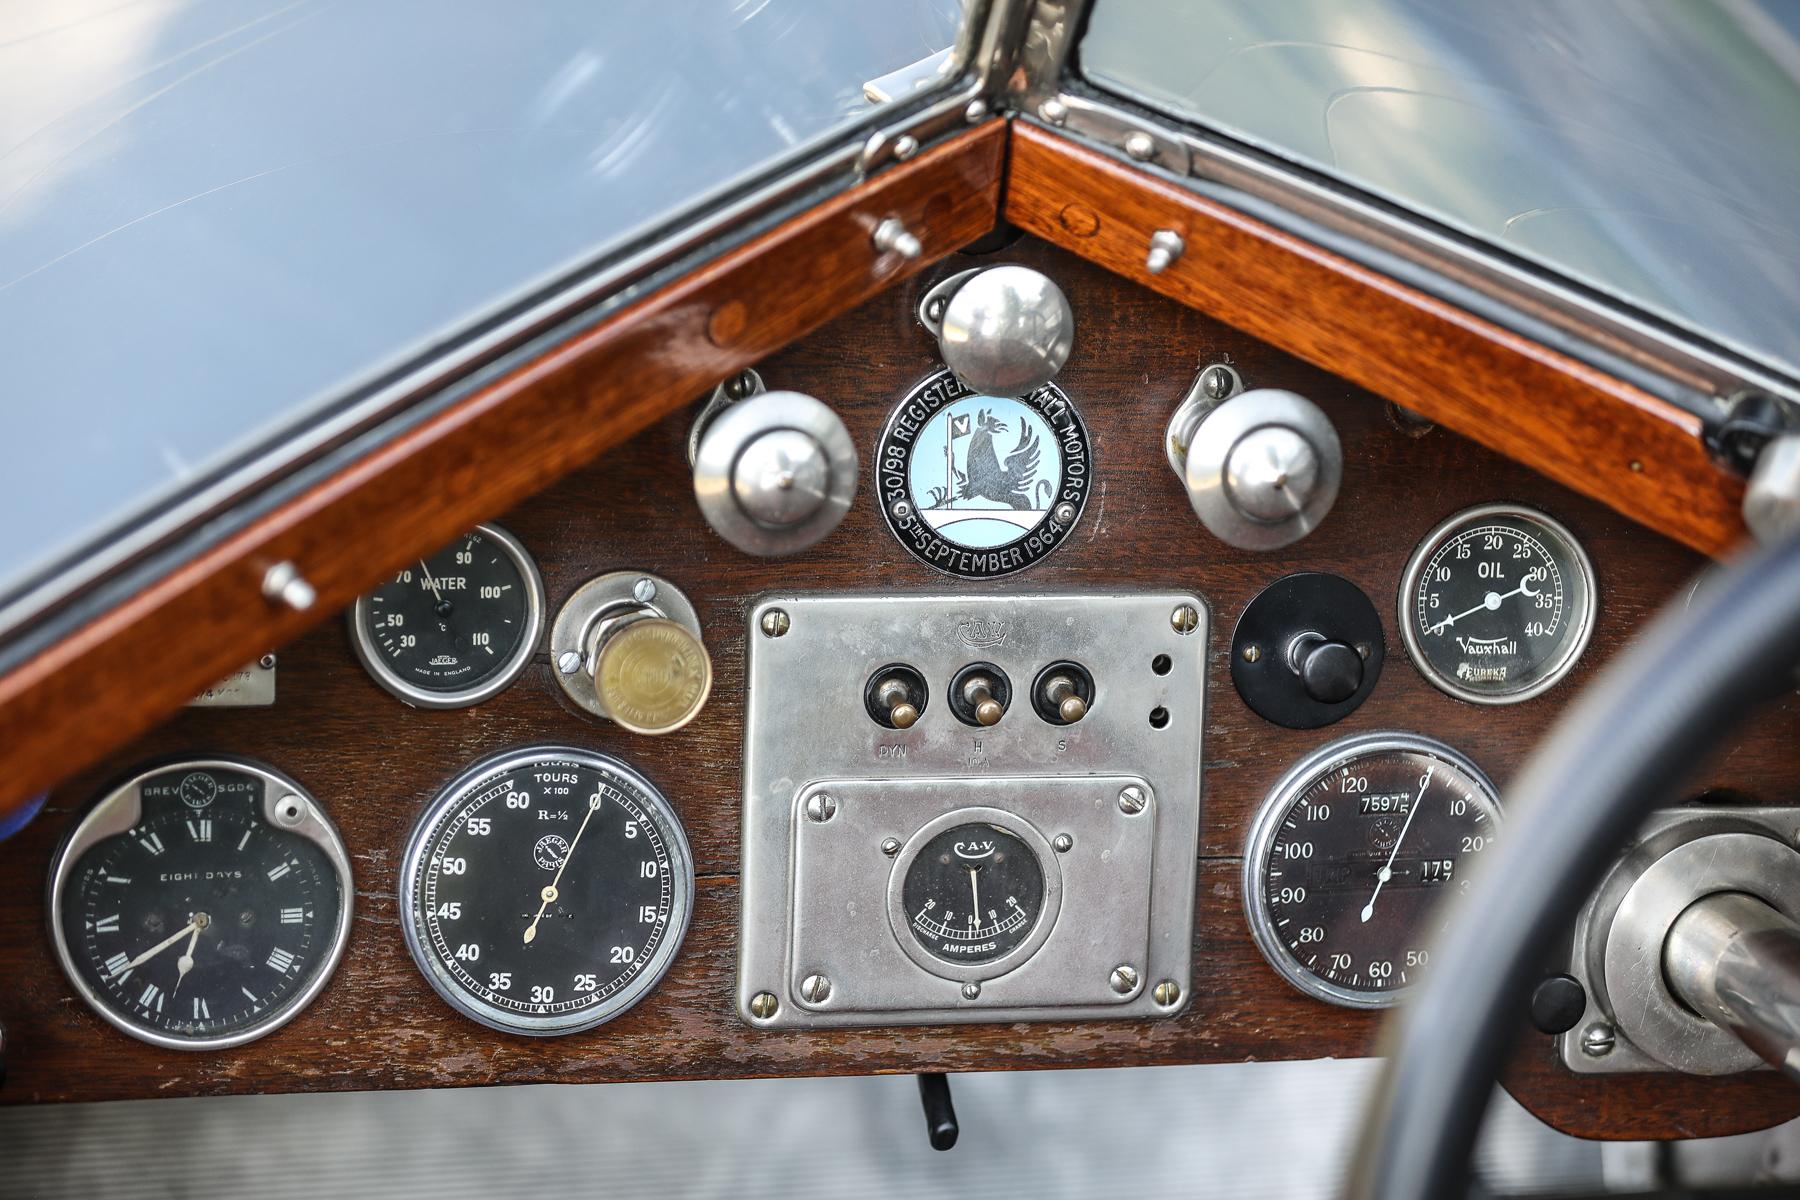 1924 Vauxhall 30-98 Type OE Wensum instruments